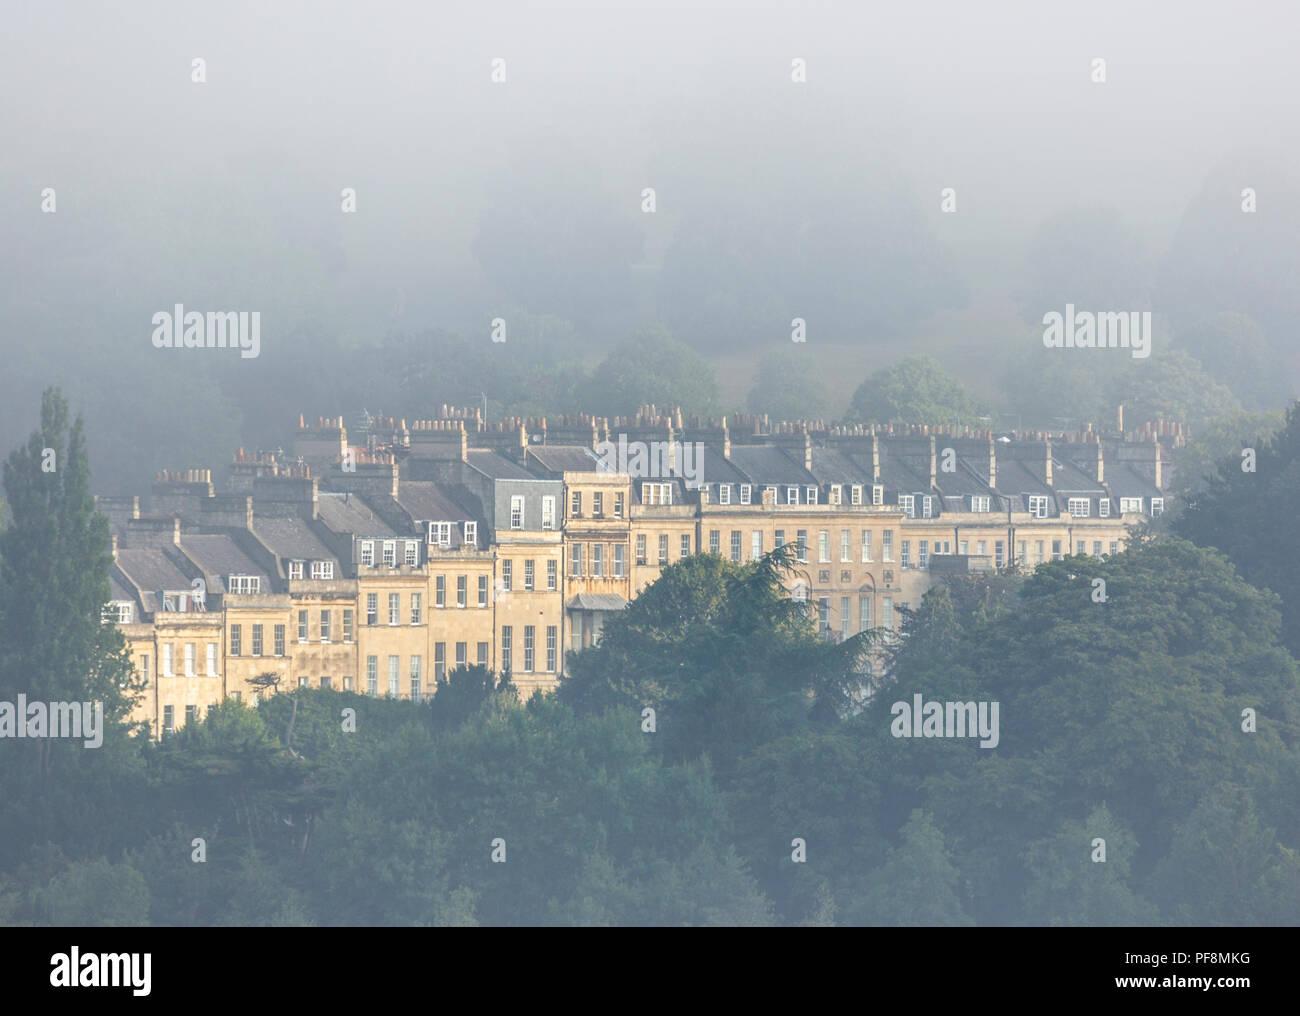 A row of terraced Georgian buildings shrouded in morning mist  in Bath, UK - Stock Image